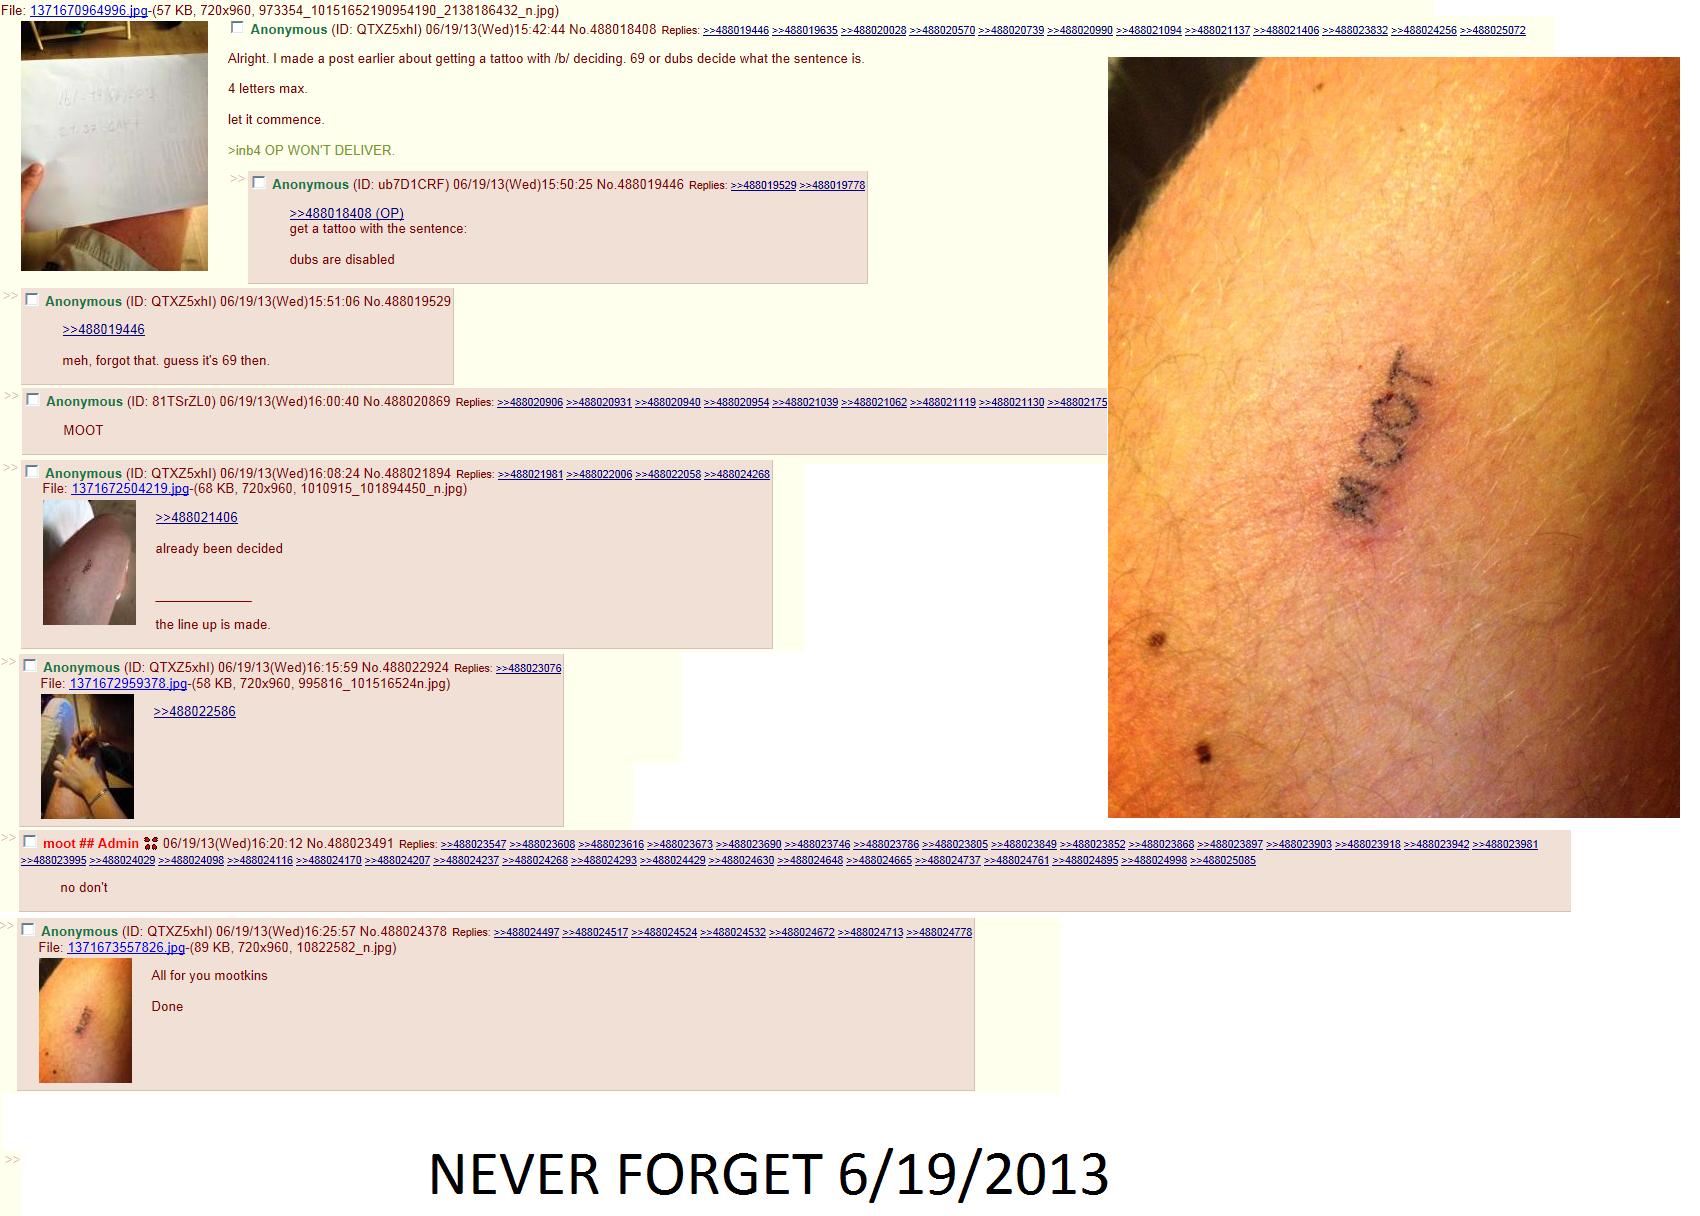 Moot tattoo. (enlarge).. what a retard moot Tattoo 4Chan